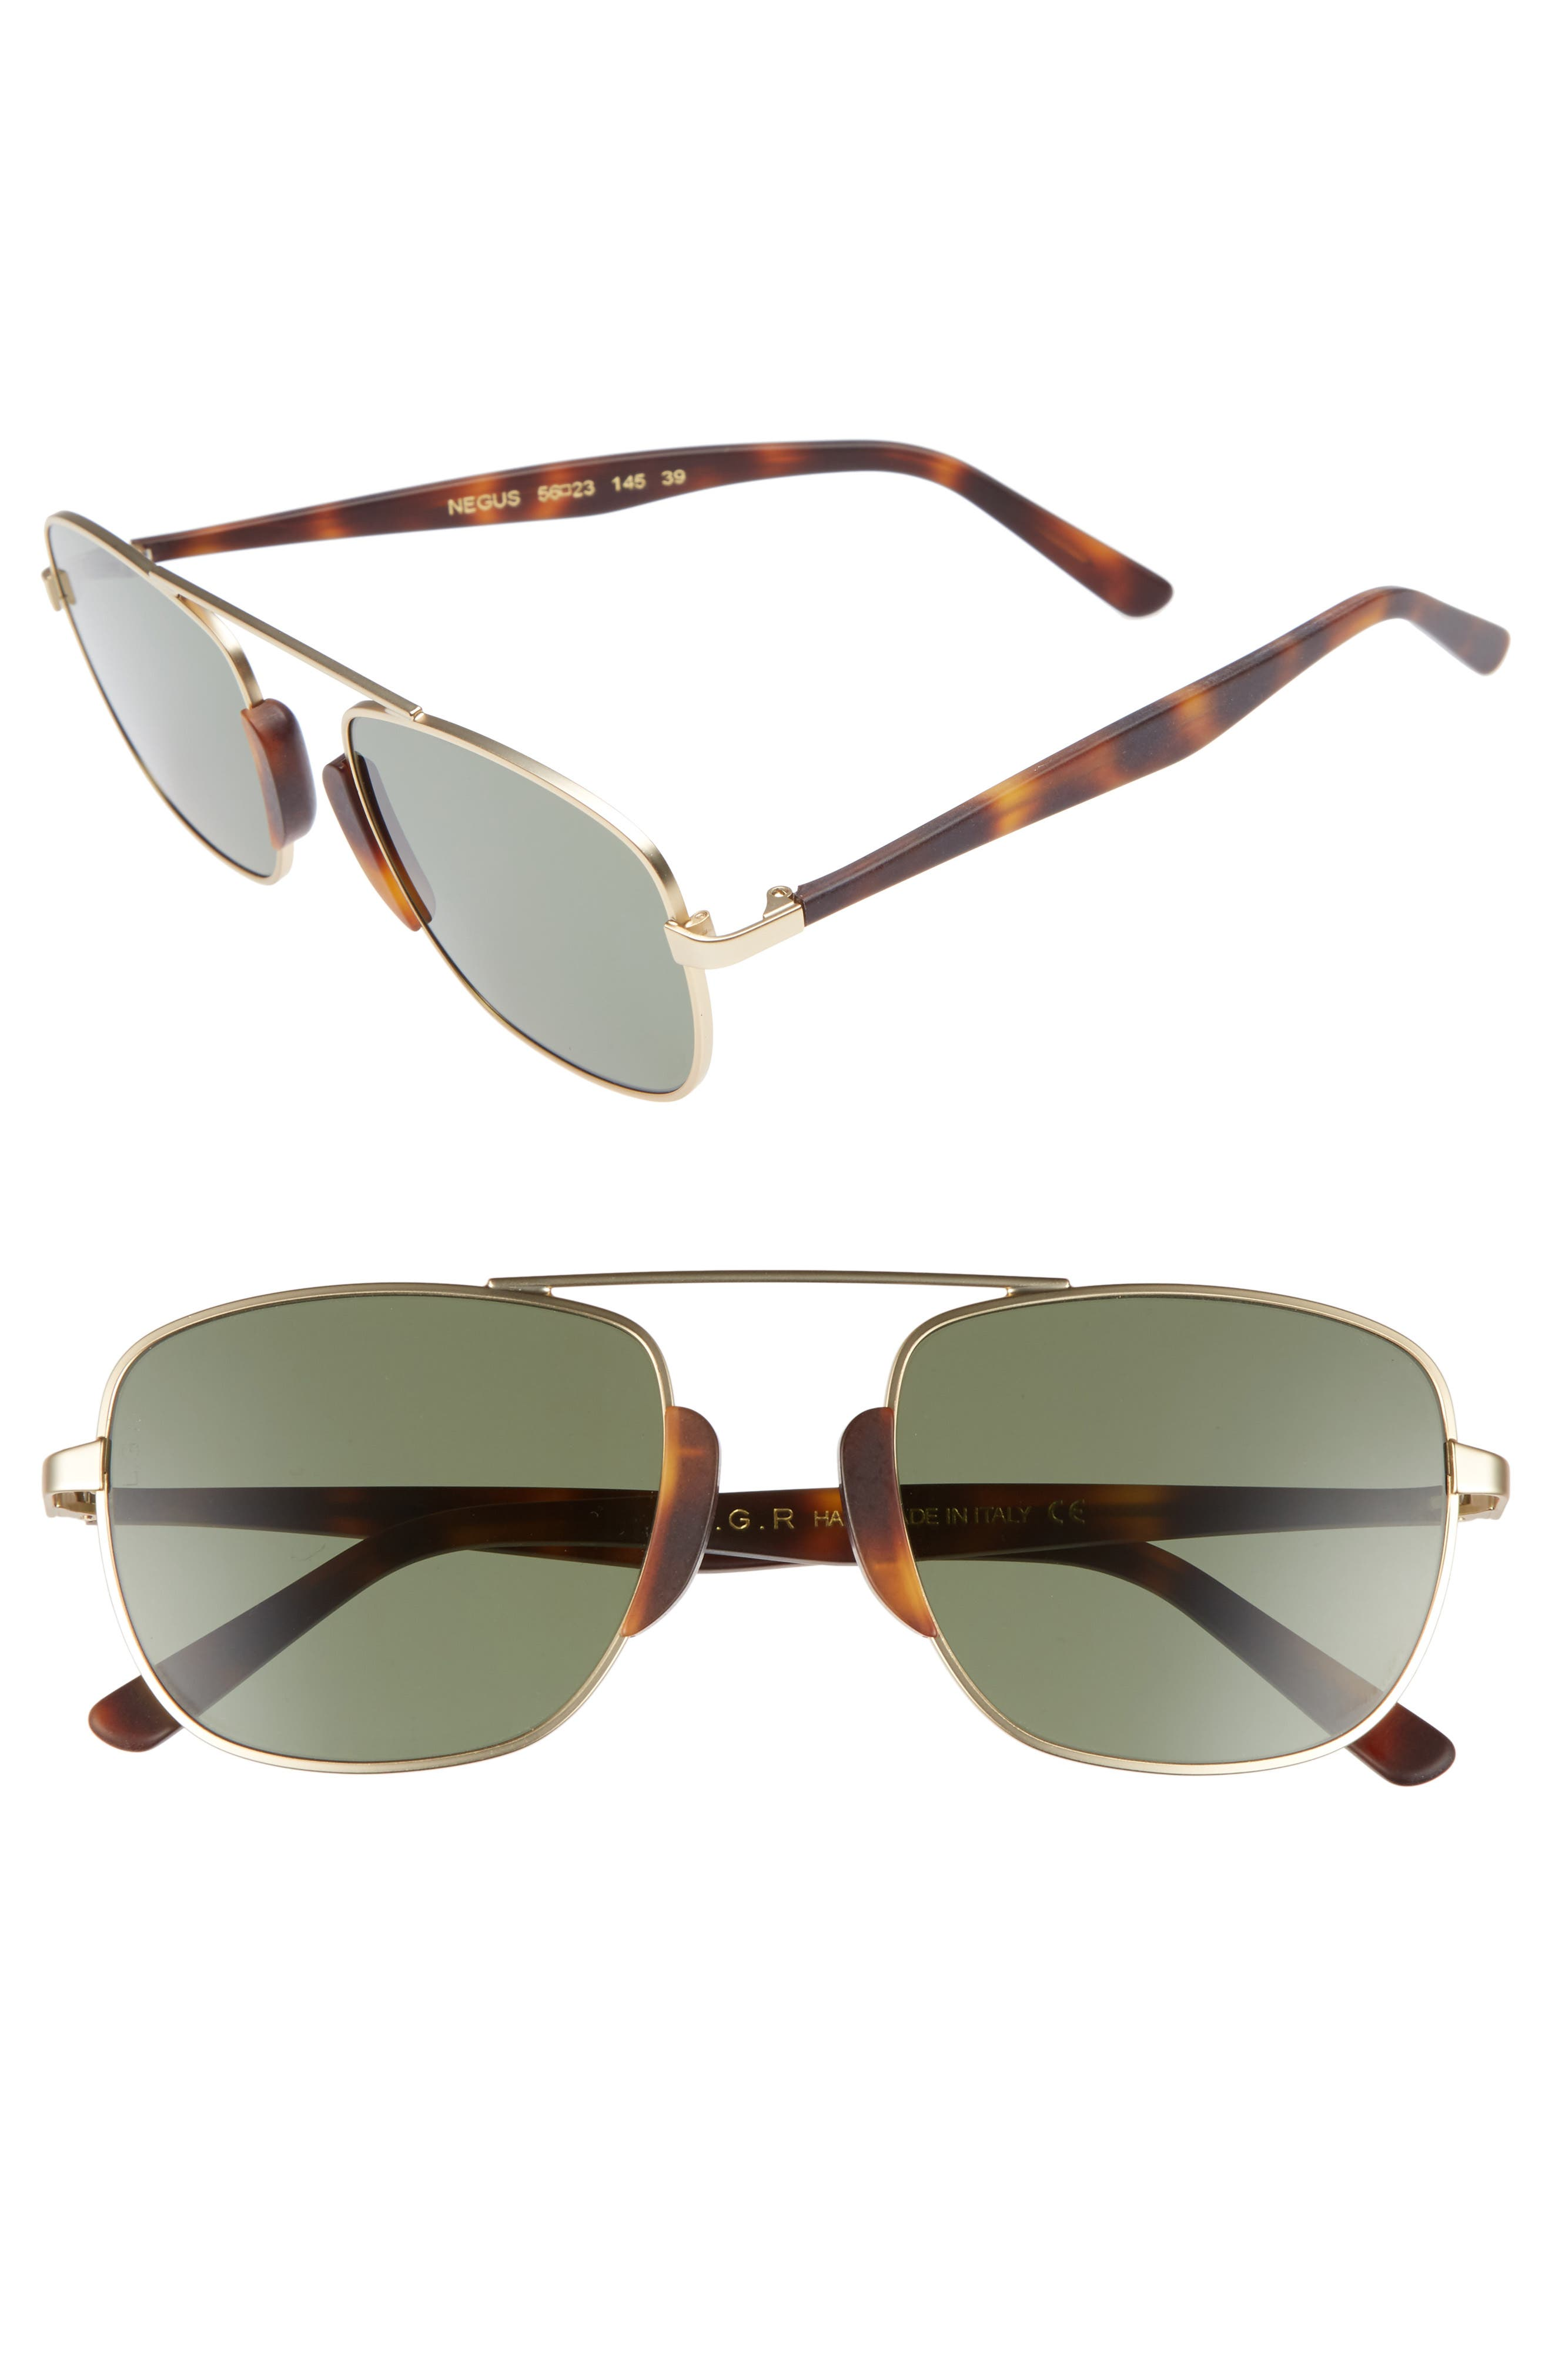 Negus 56mm Sunglasses,                             Main thumbnail 1, color,                             Gold Matte/ Brown/ Green